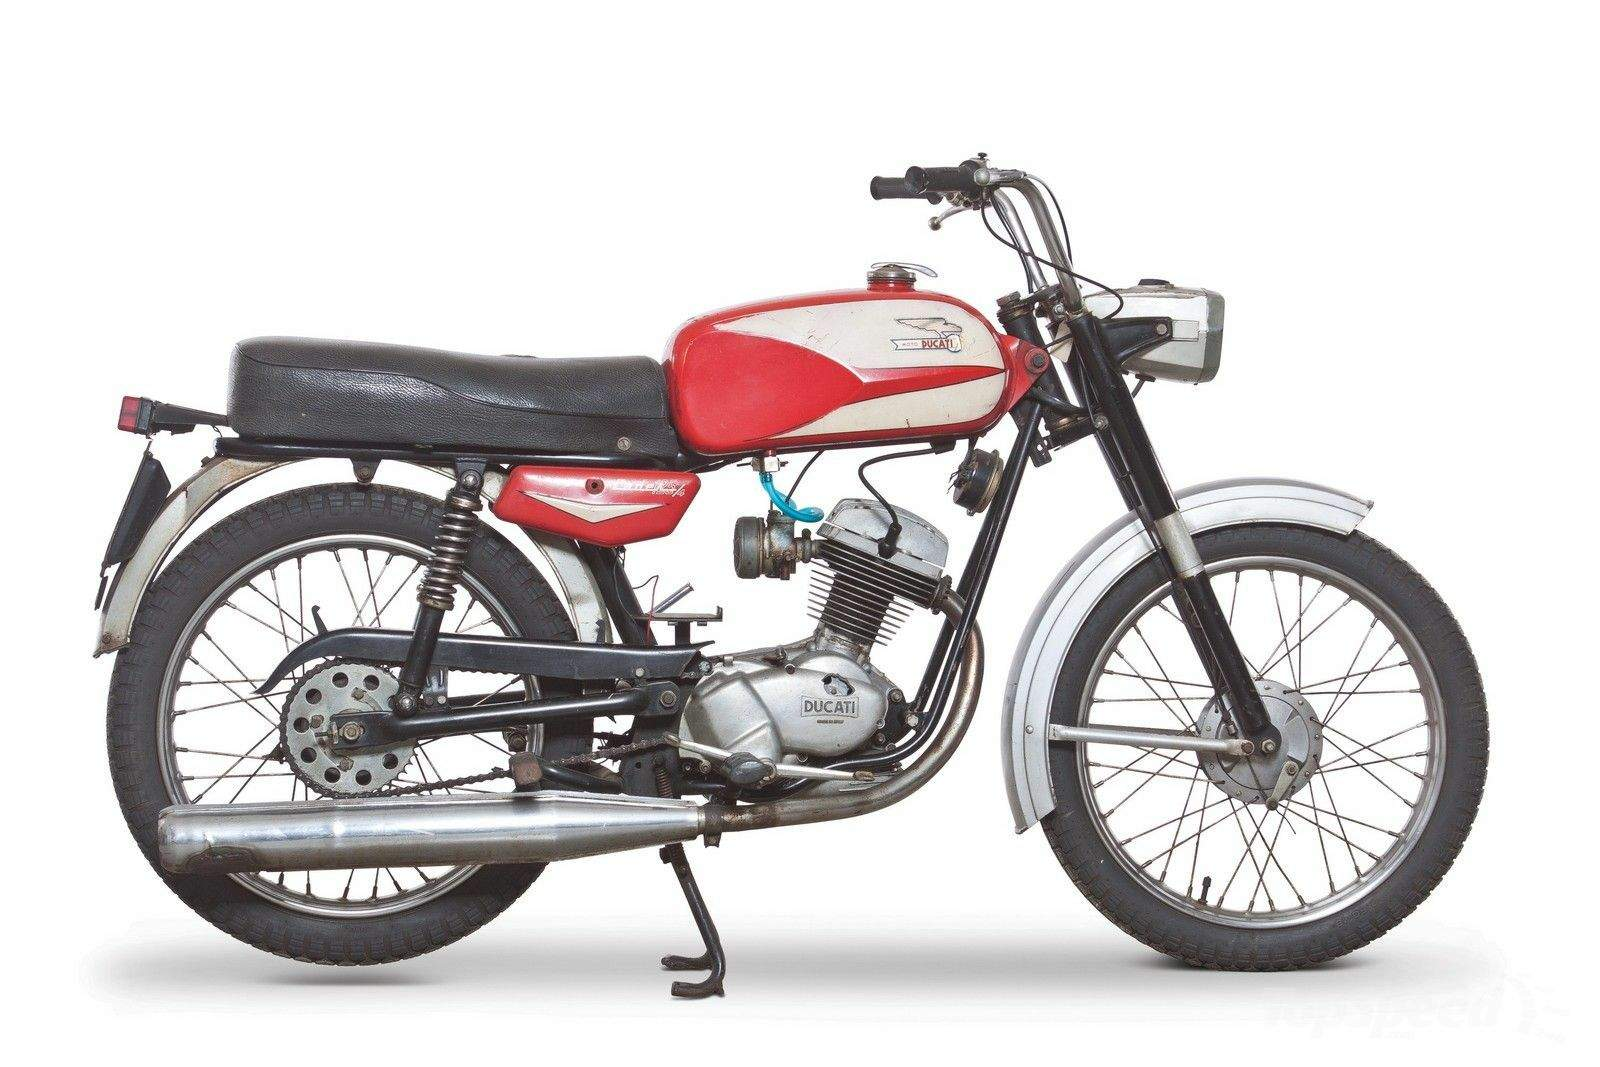 ducati 125 cadet 4 1967 1968 autoevolution. Black Bedroom Furniture Sets. Home Design Ideas